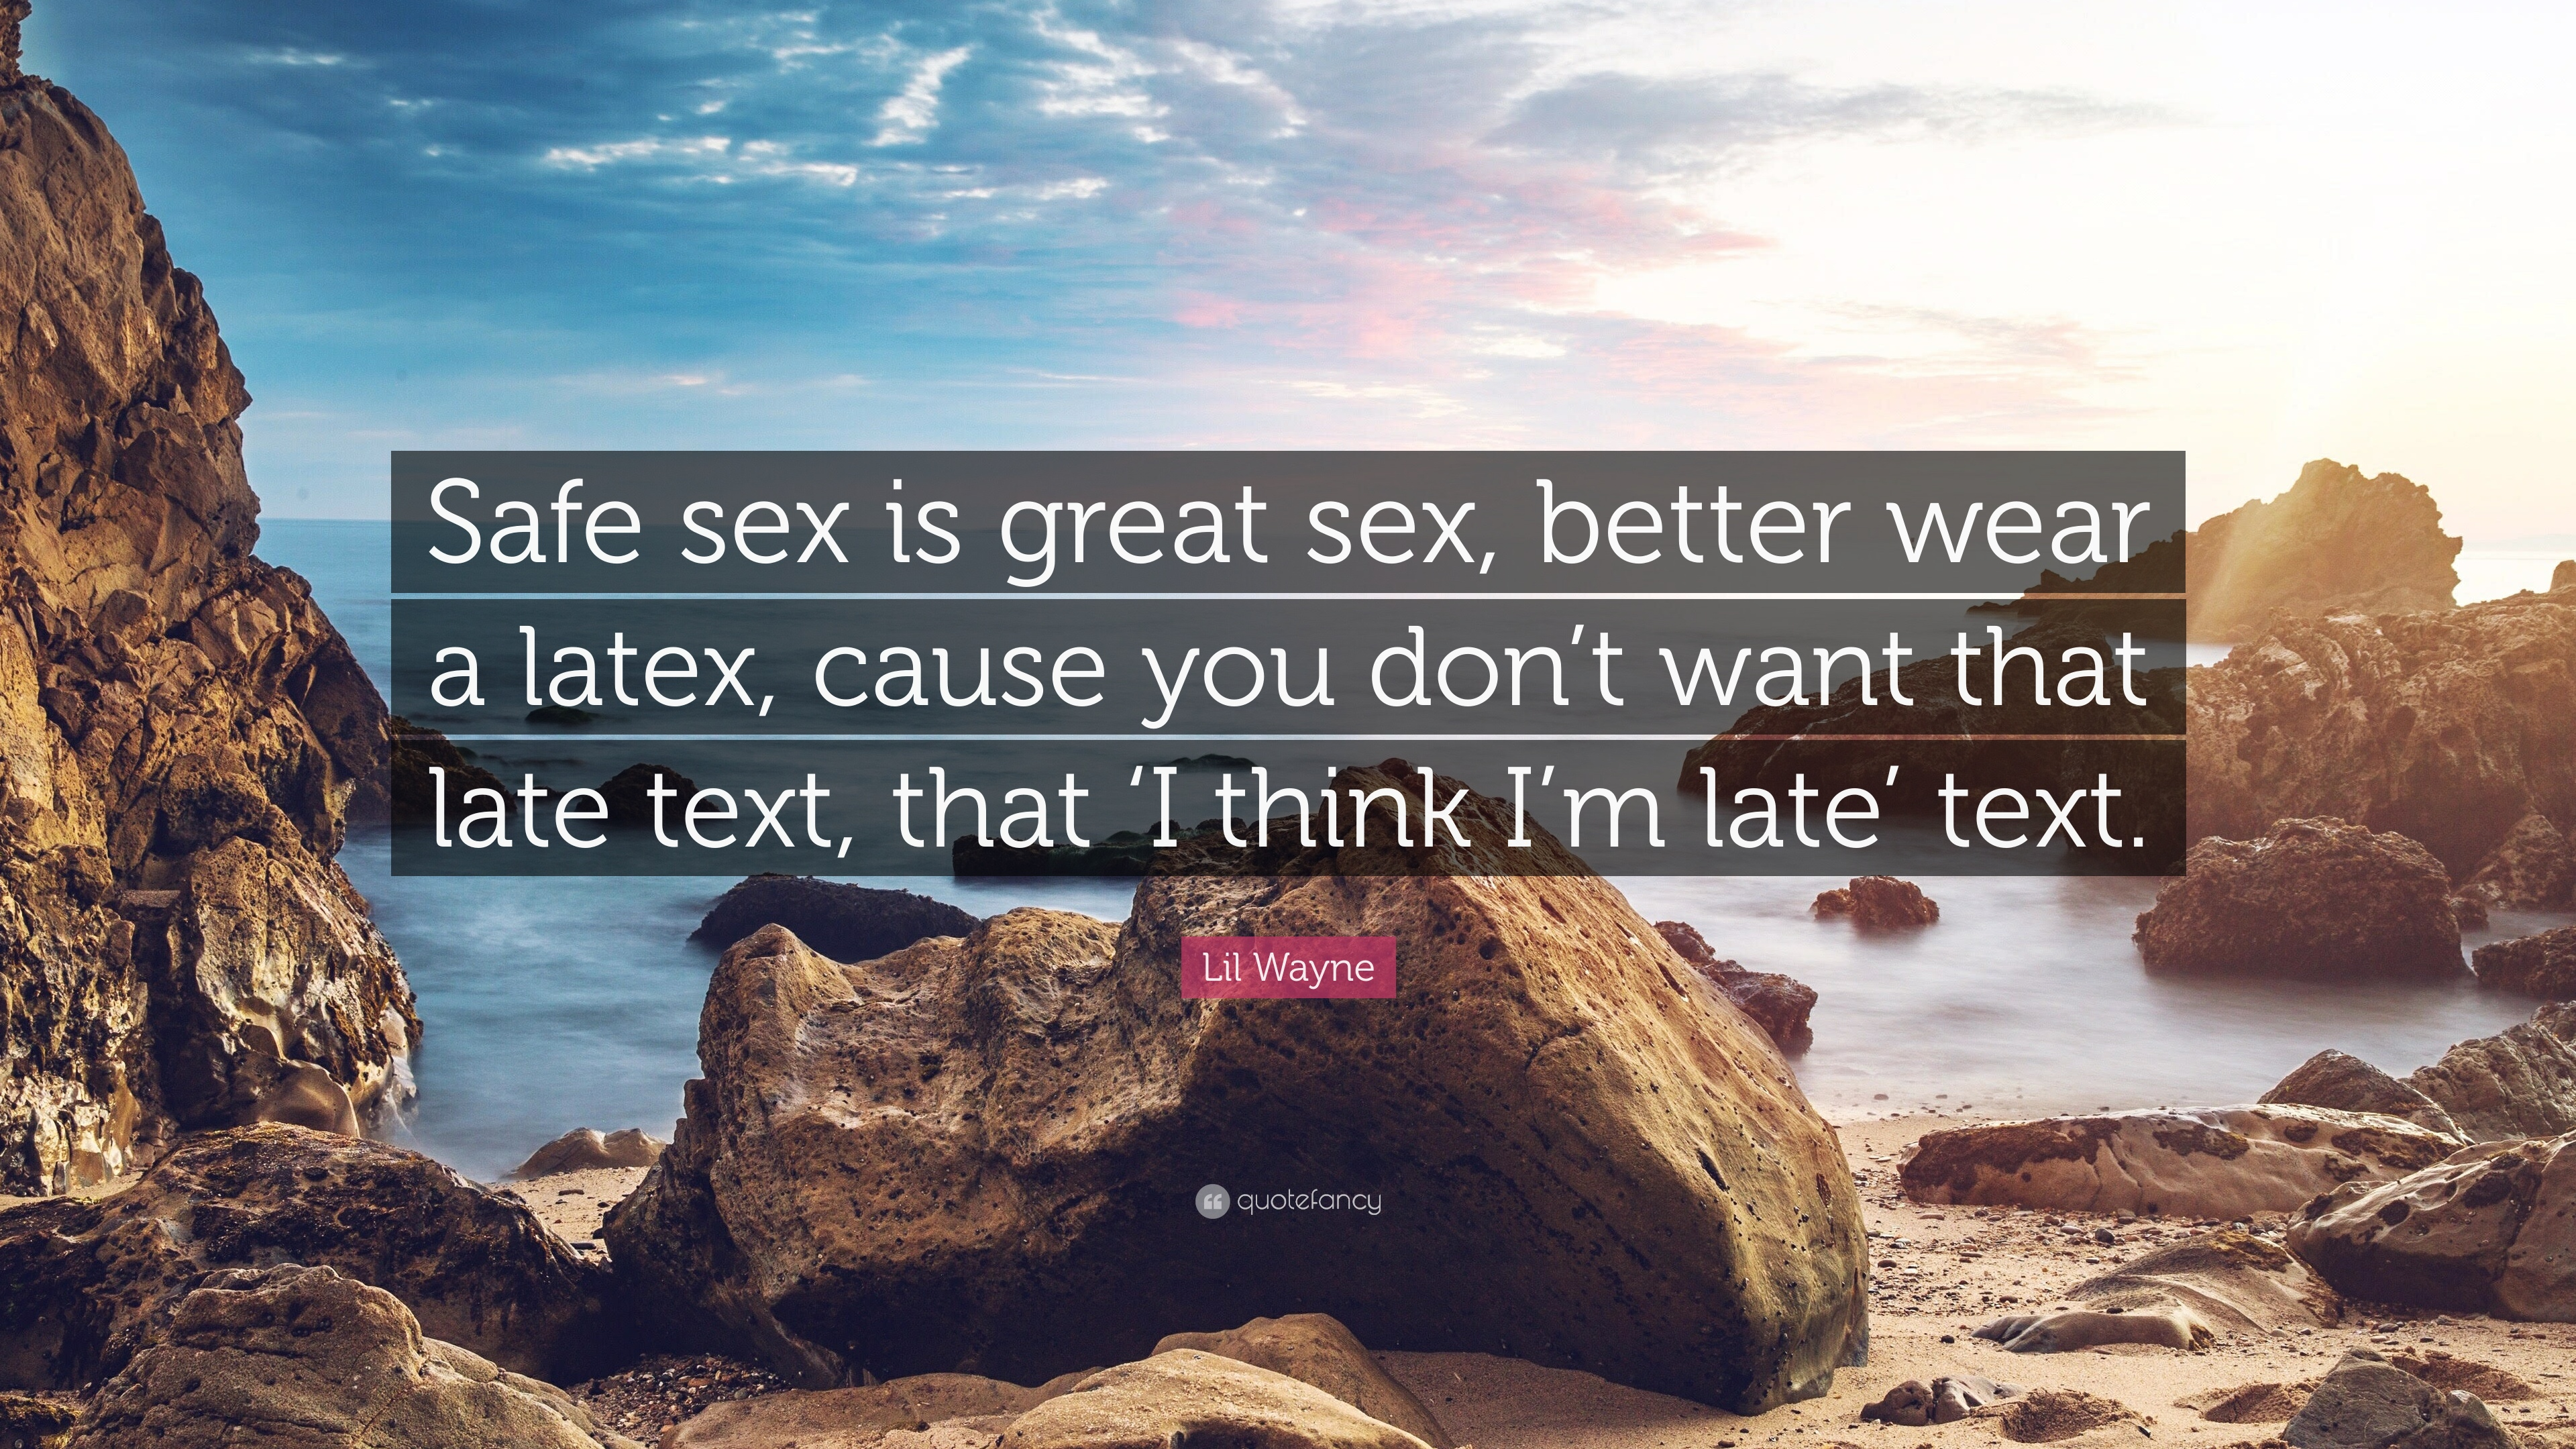 Safe sex is great better wear latex